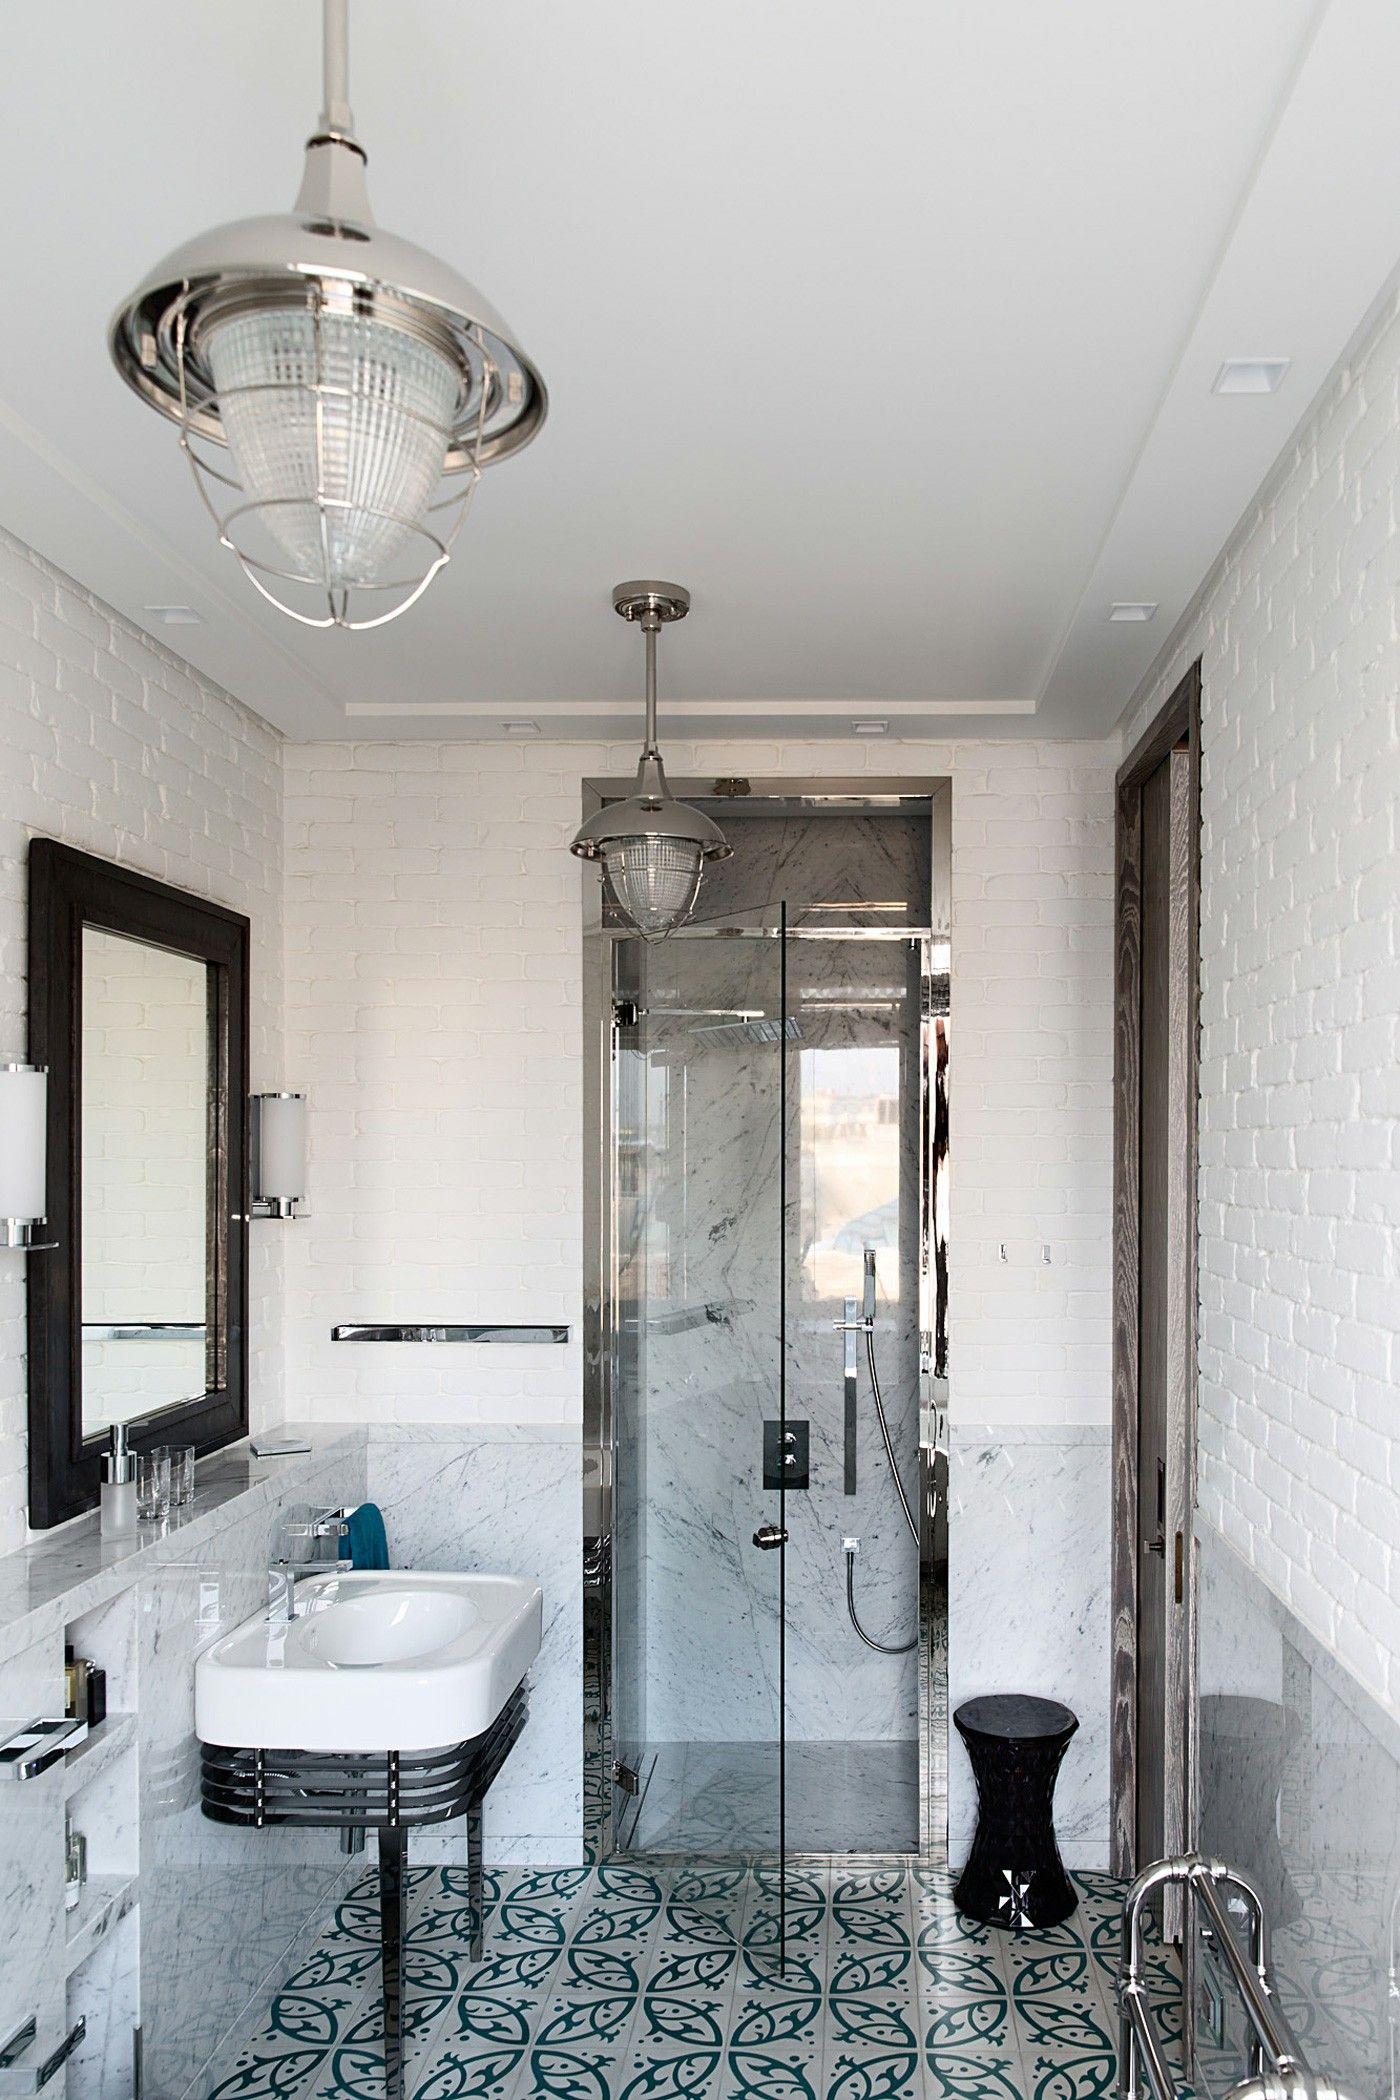 Baths interior bathroom interior design bath design washroom bathroom inspiration bathroom